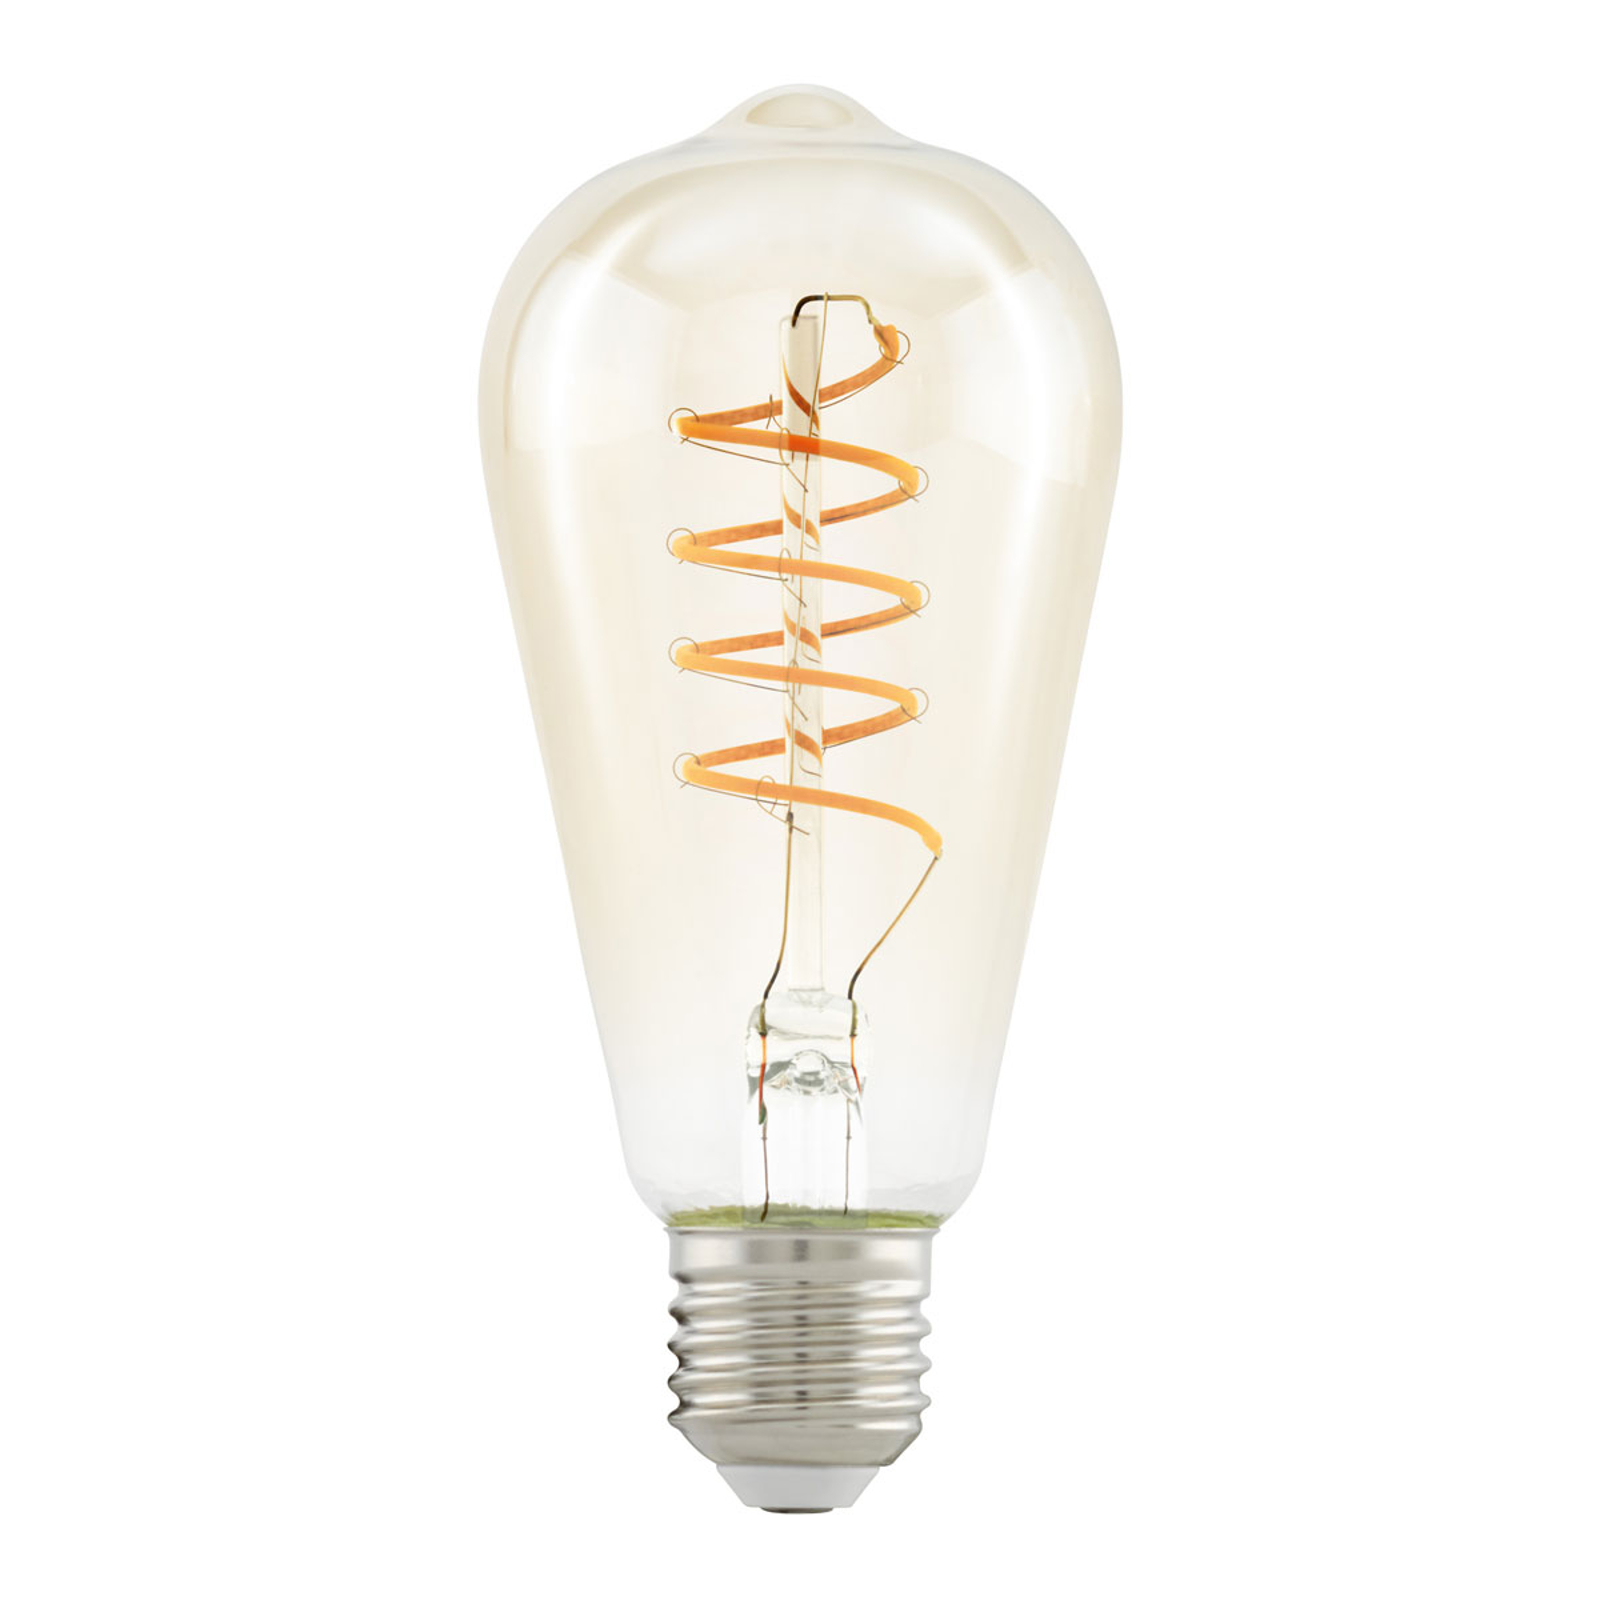 LED-Lampe E27 ST64 4W Spiral, warmweiß, klar kaufen